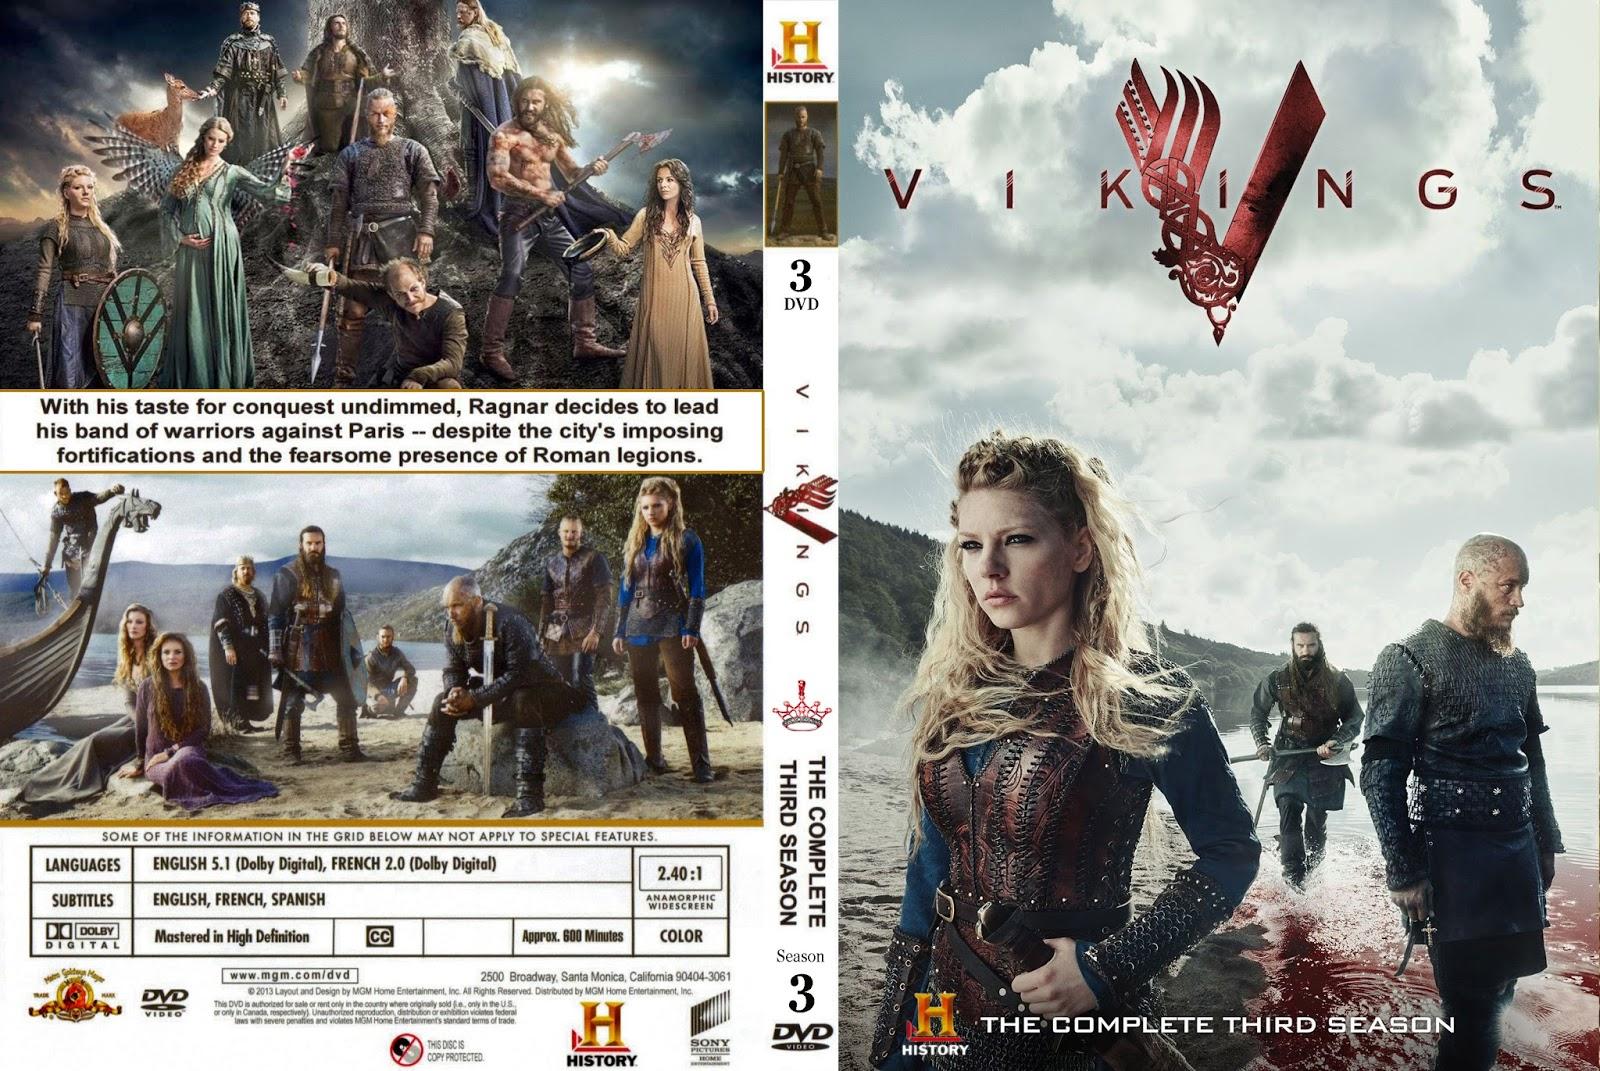 Download Vikings 3ª Temporada Completa DVD-R 66 2B  2BVikings 2BSeason 2B3 2B 25282015 2529 2B3 2BDVD